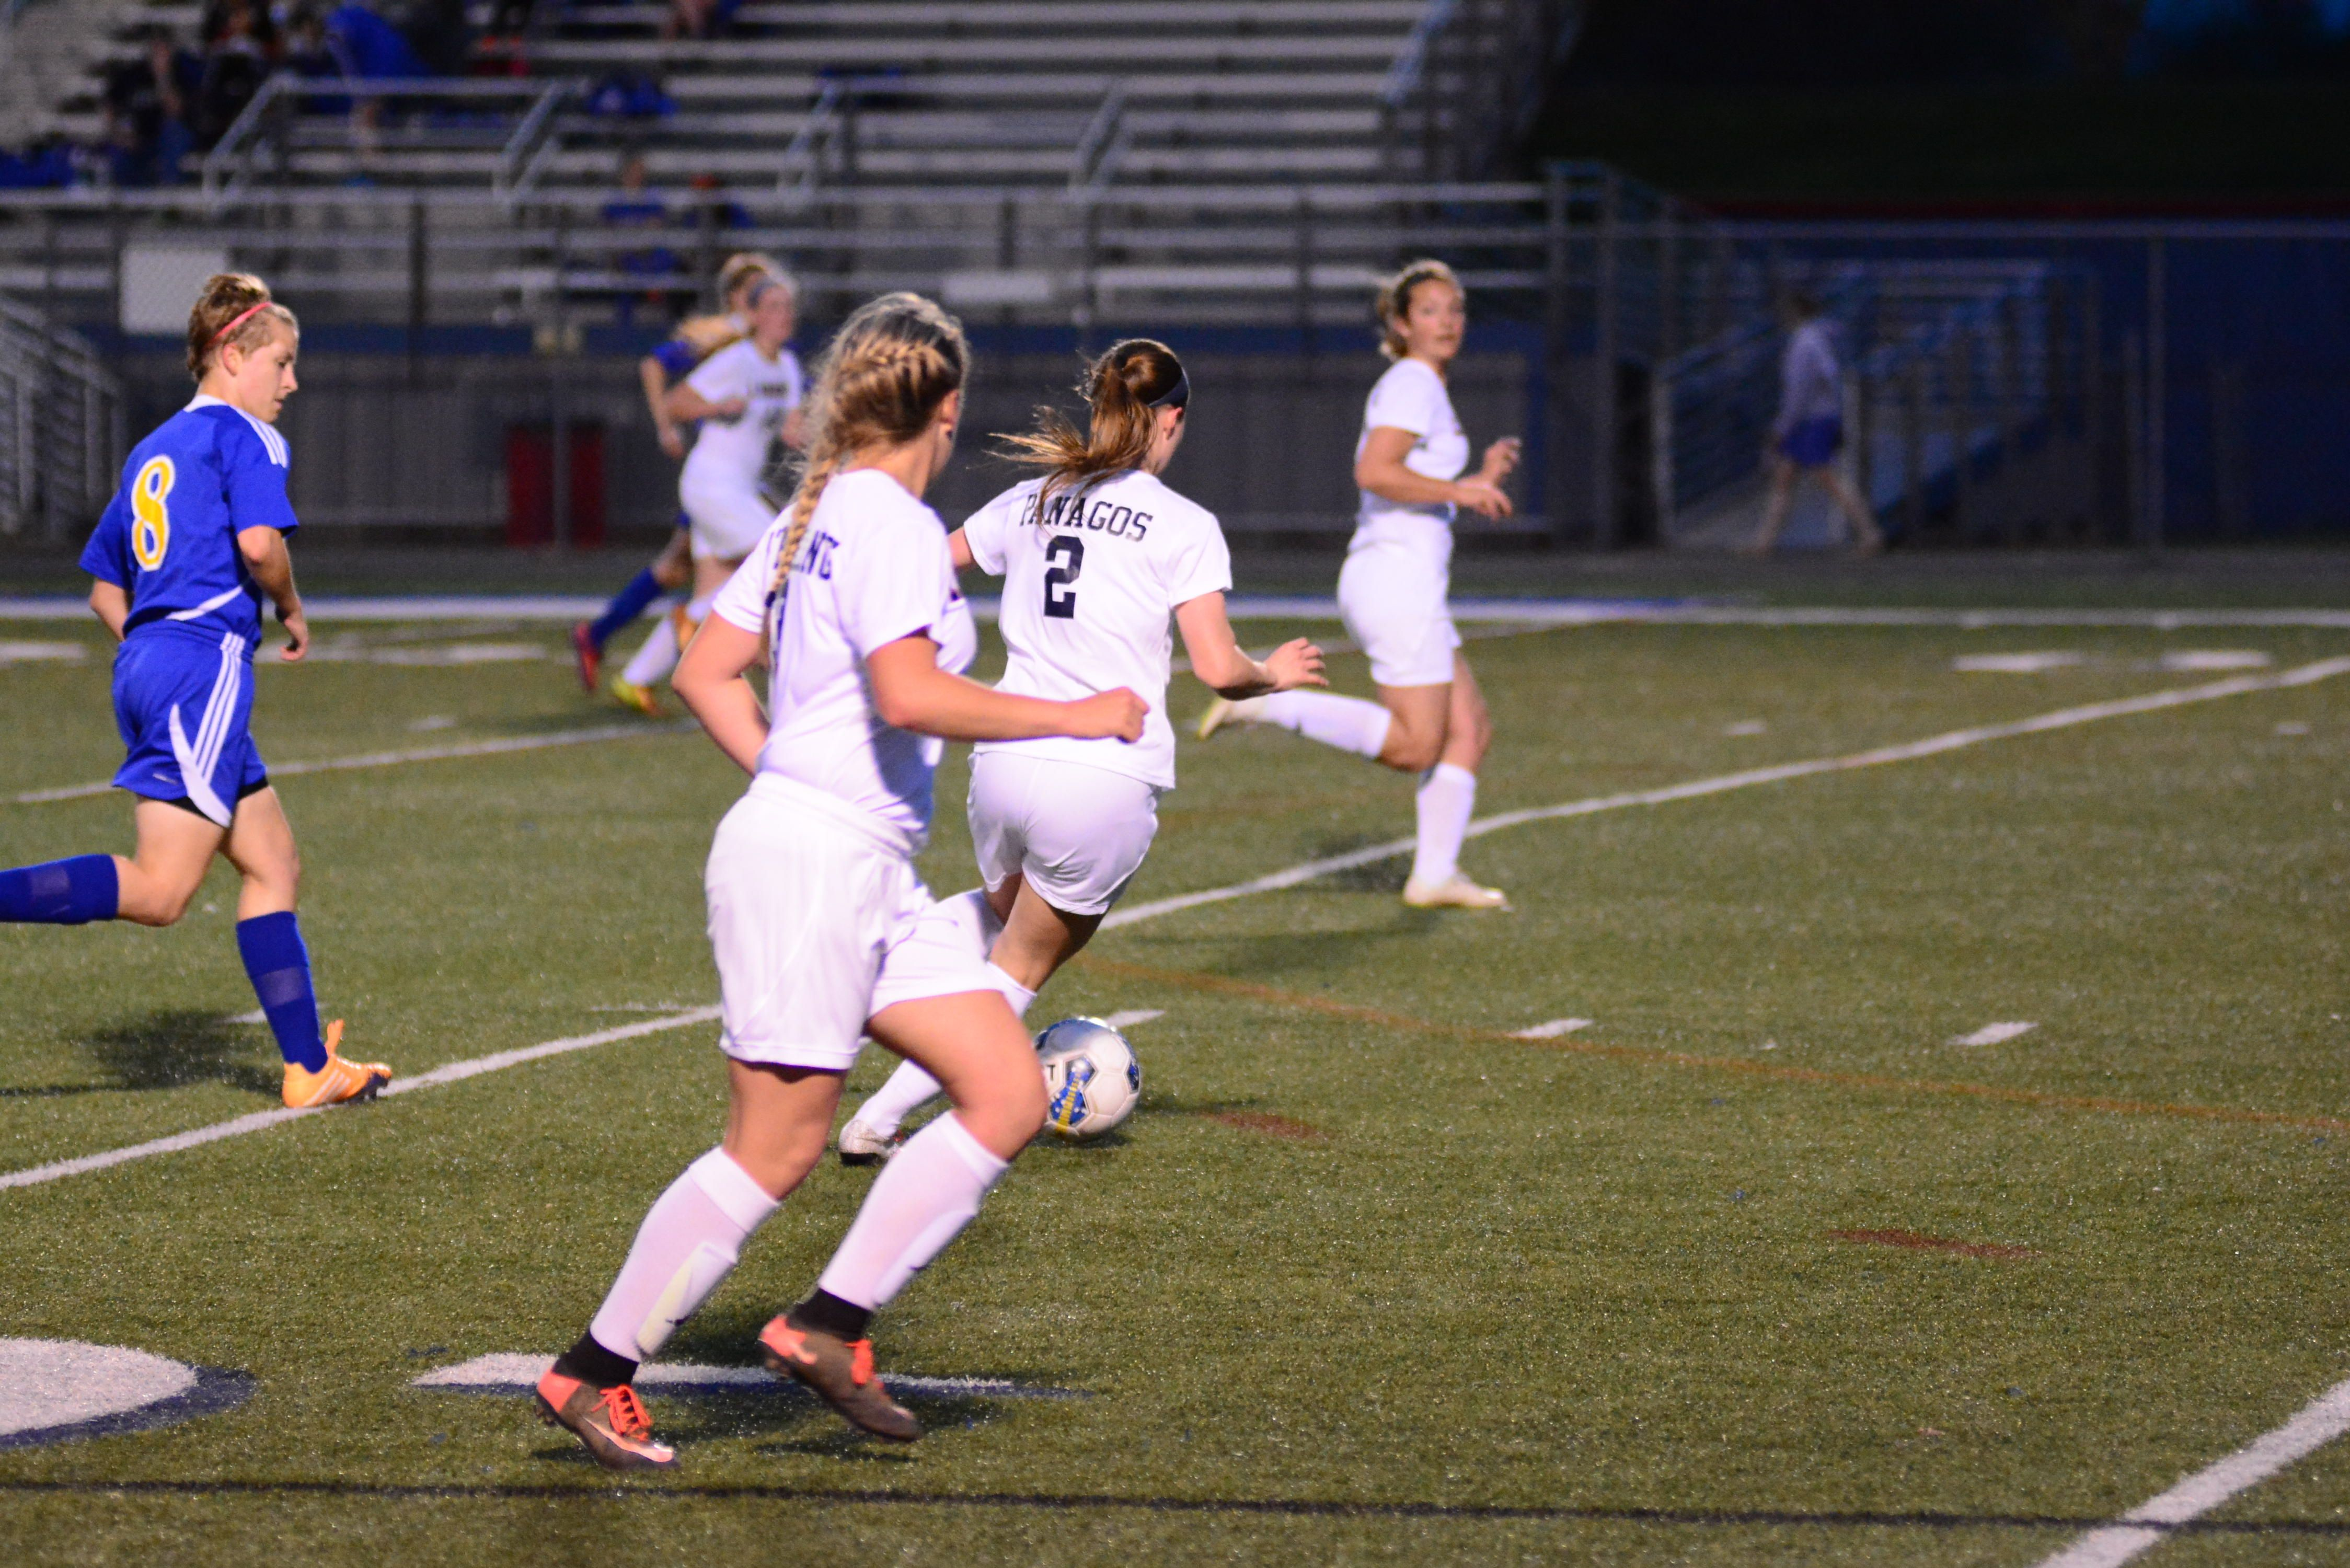 2016 Girls Soccer Girls Soccer School Girl Liberty High School